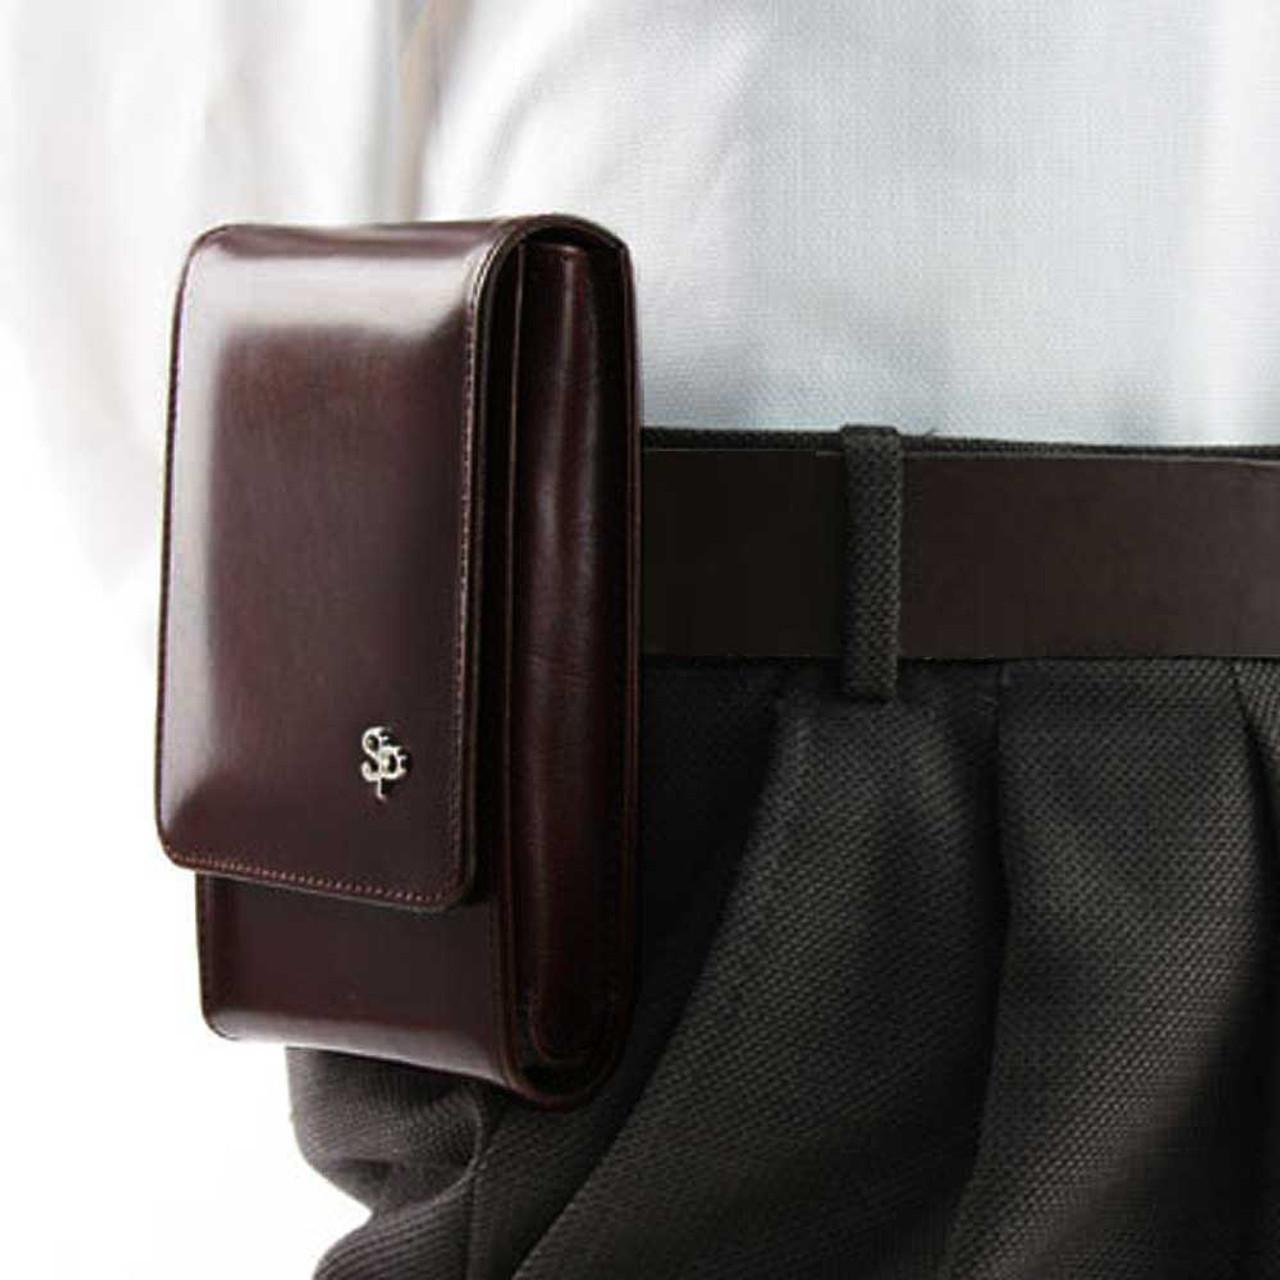 Diamondback DB380 Sneaky Pete Holster (Belt Clip)